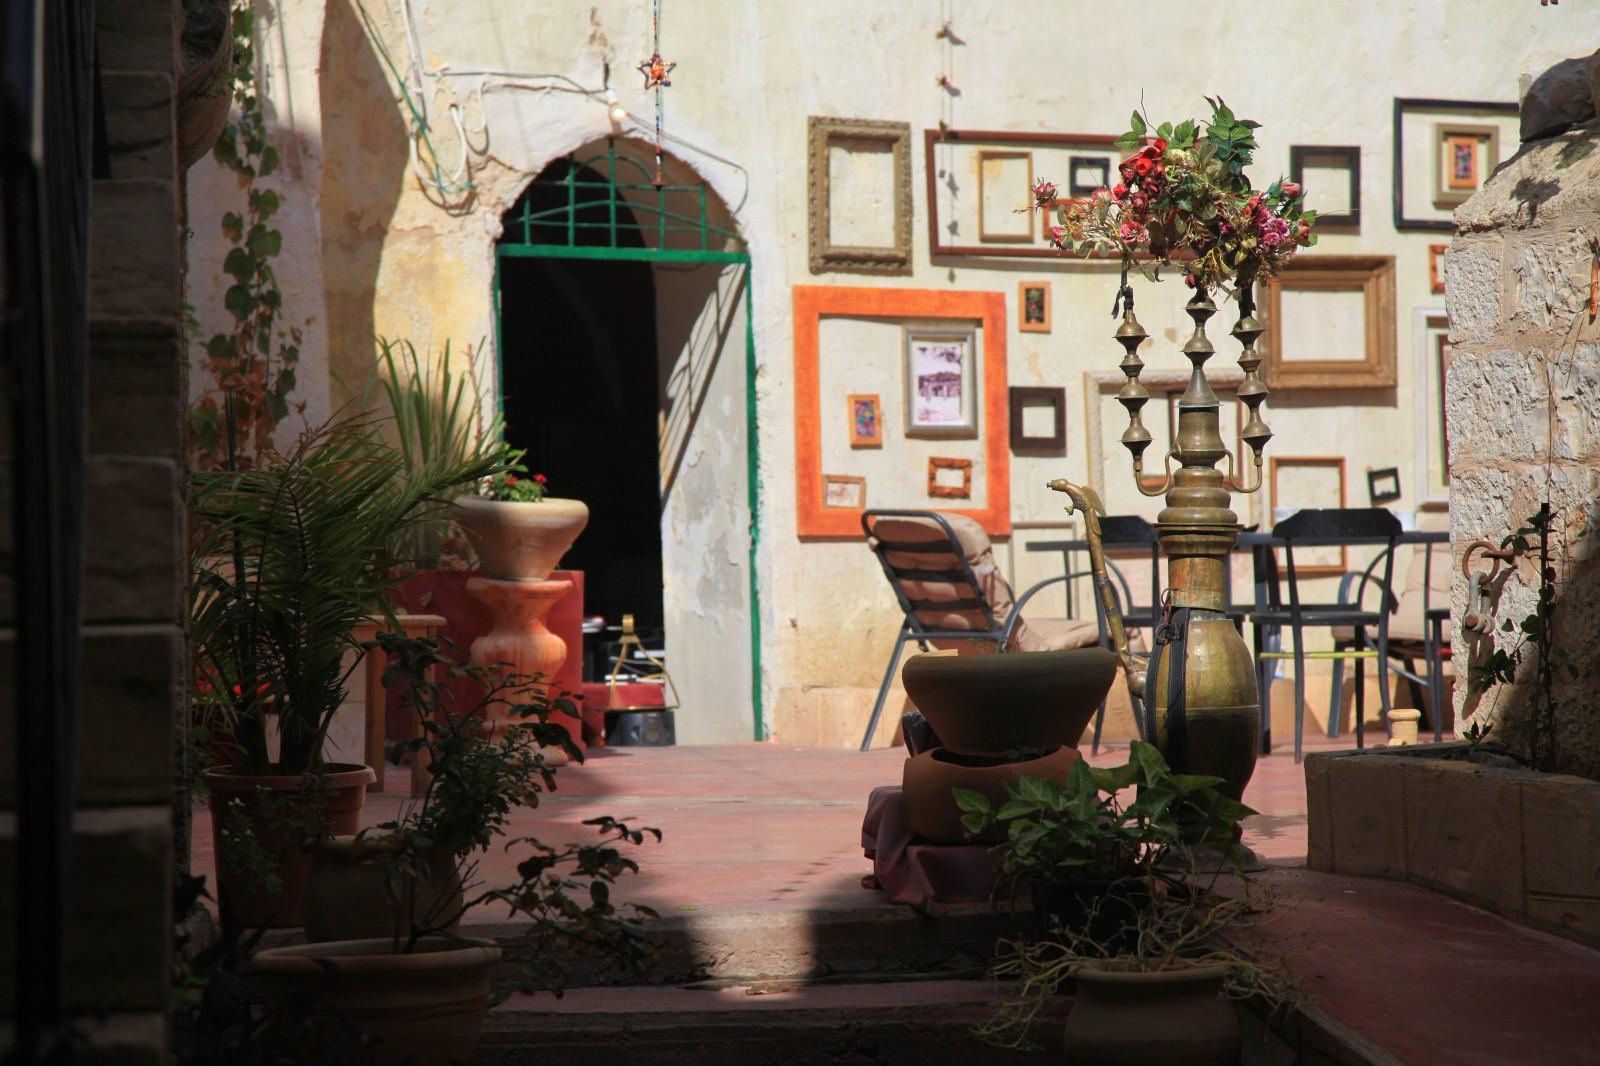 Hostel's courtyard